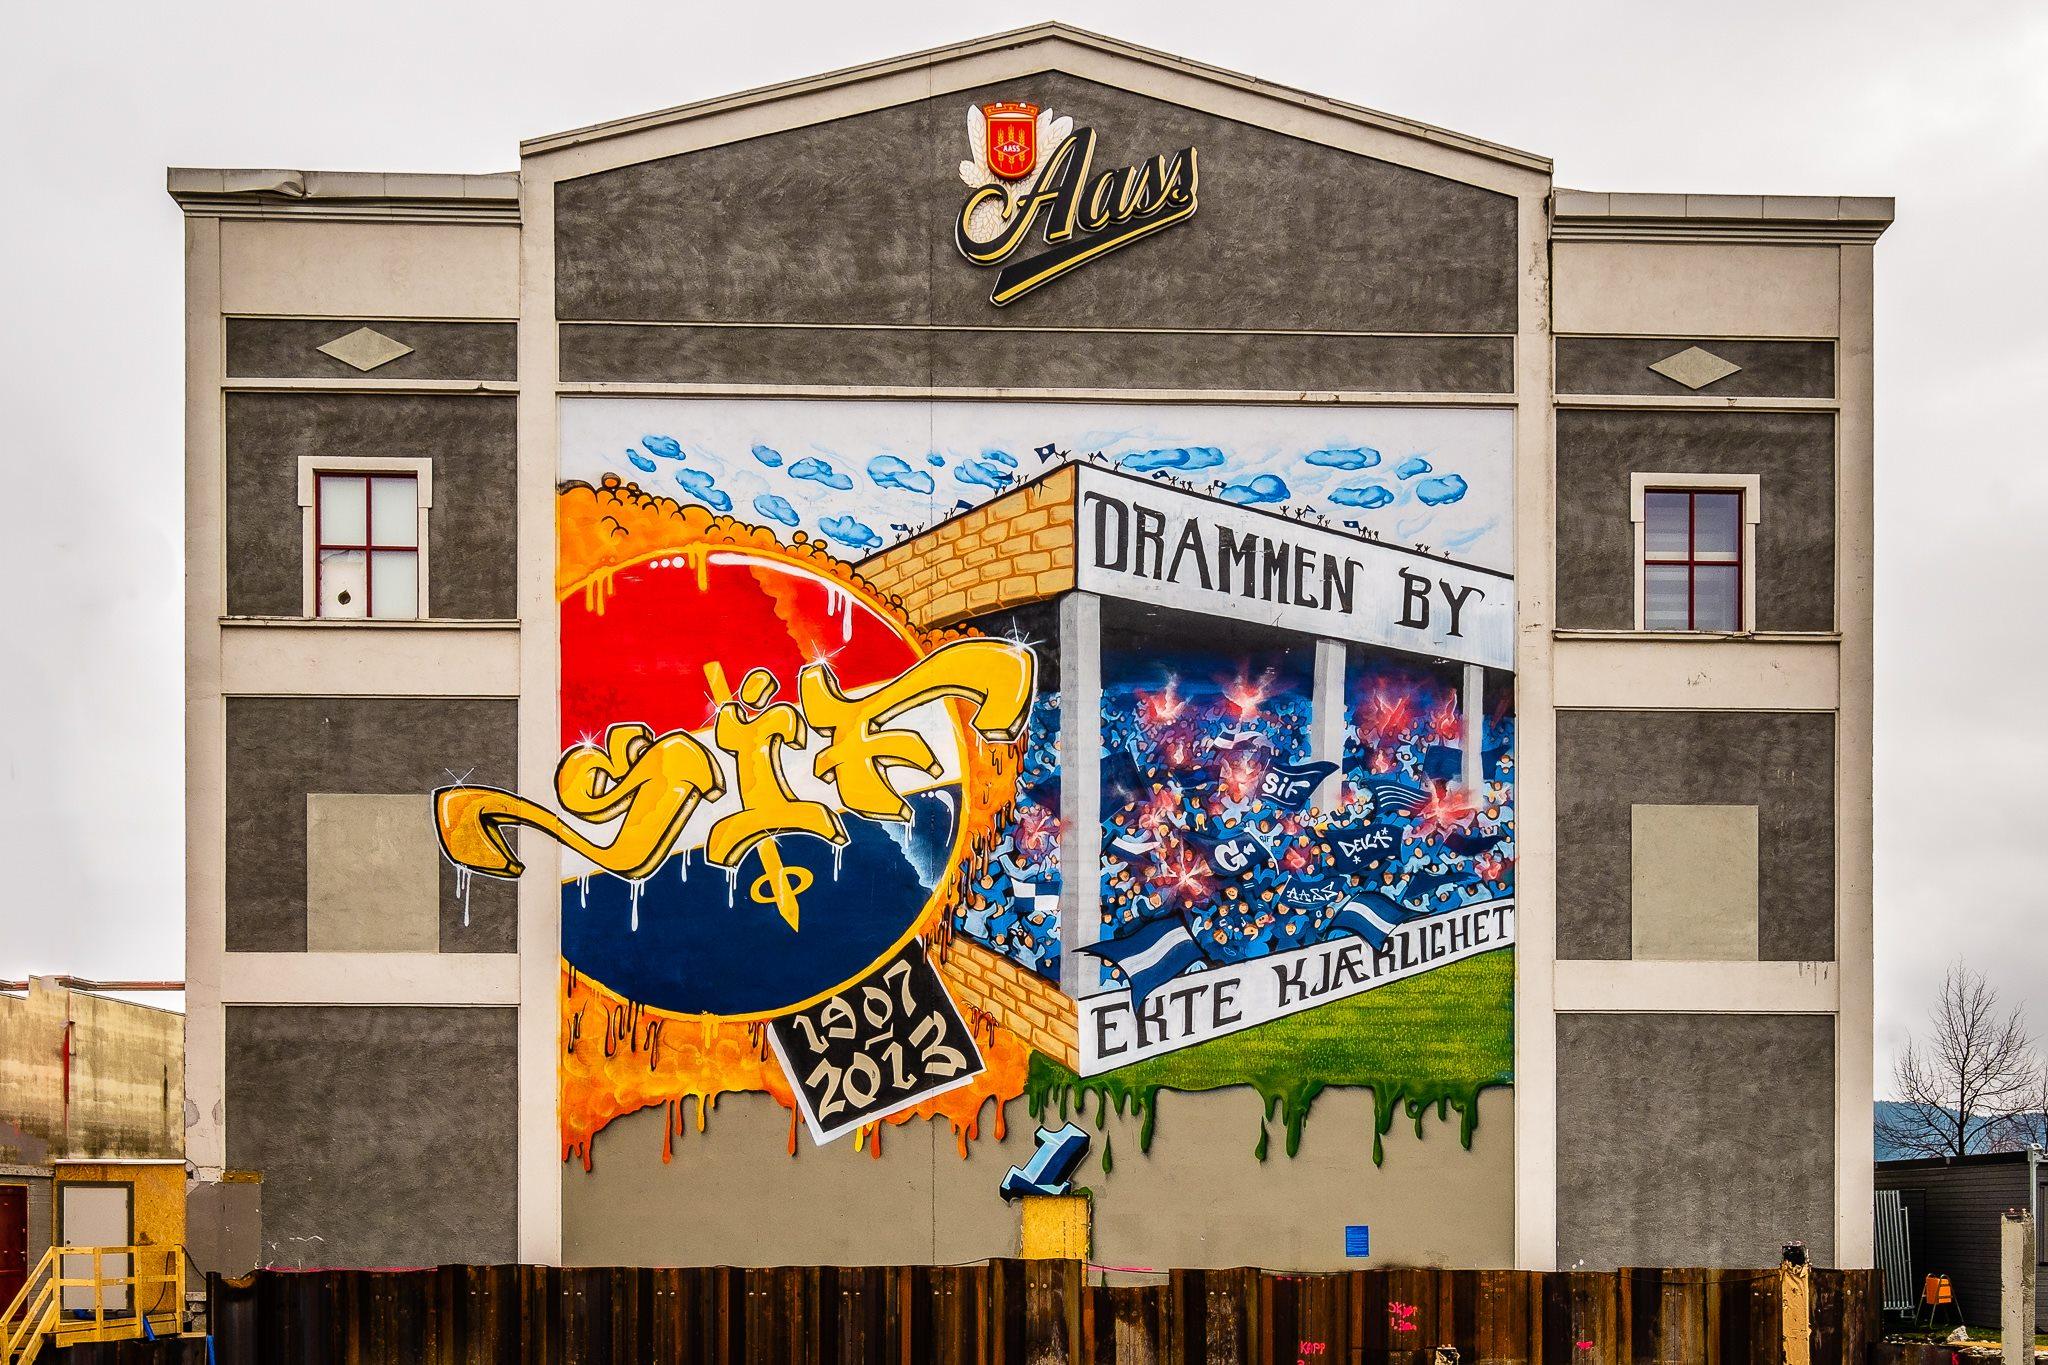 Veggmaleri på Aass bryggeri